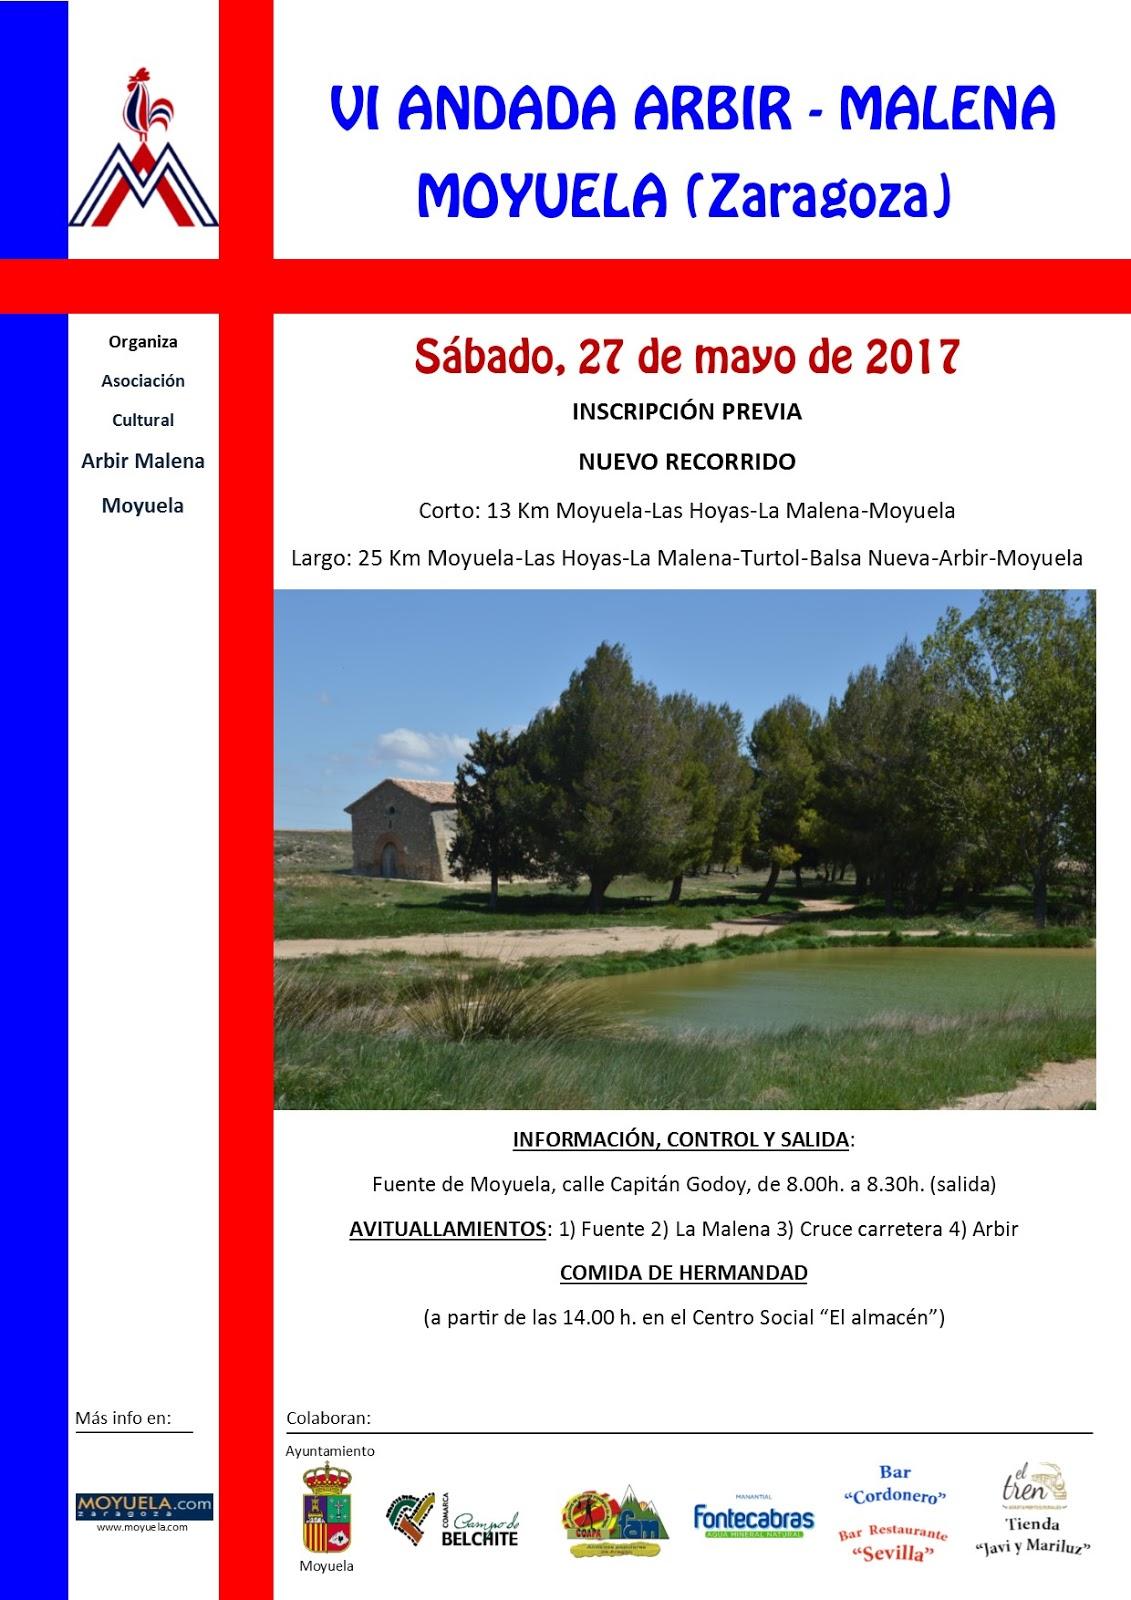 Cartel de andada Arbir-Malena 2017